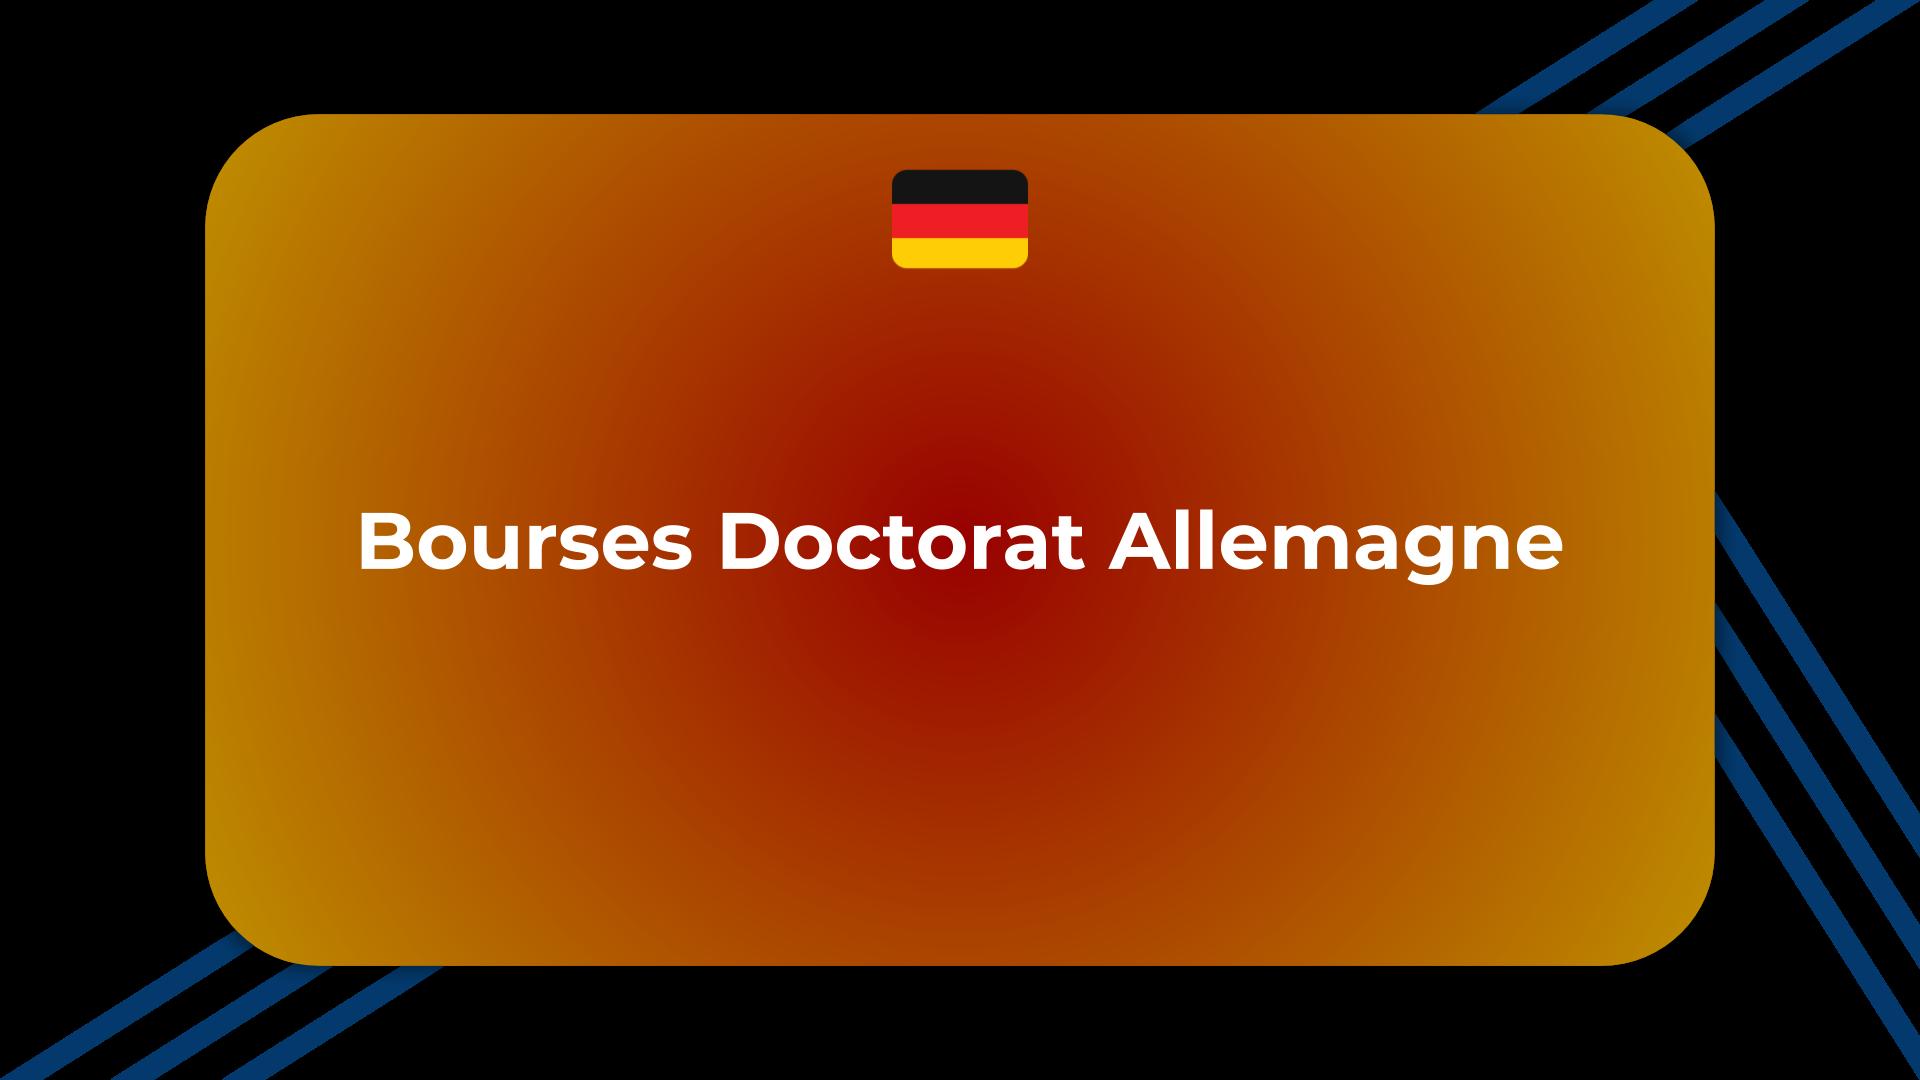 Bourses Doctorat Allemagne